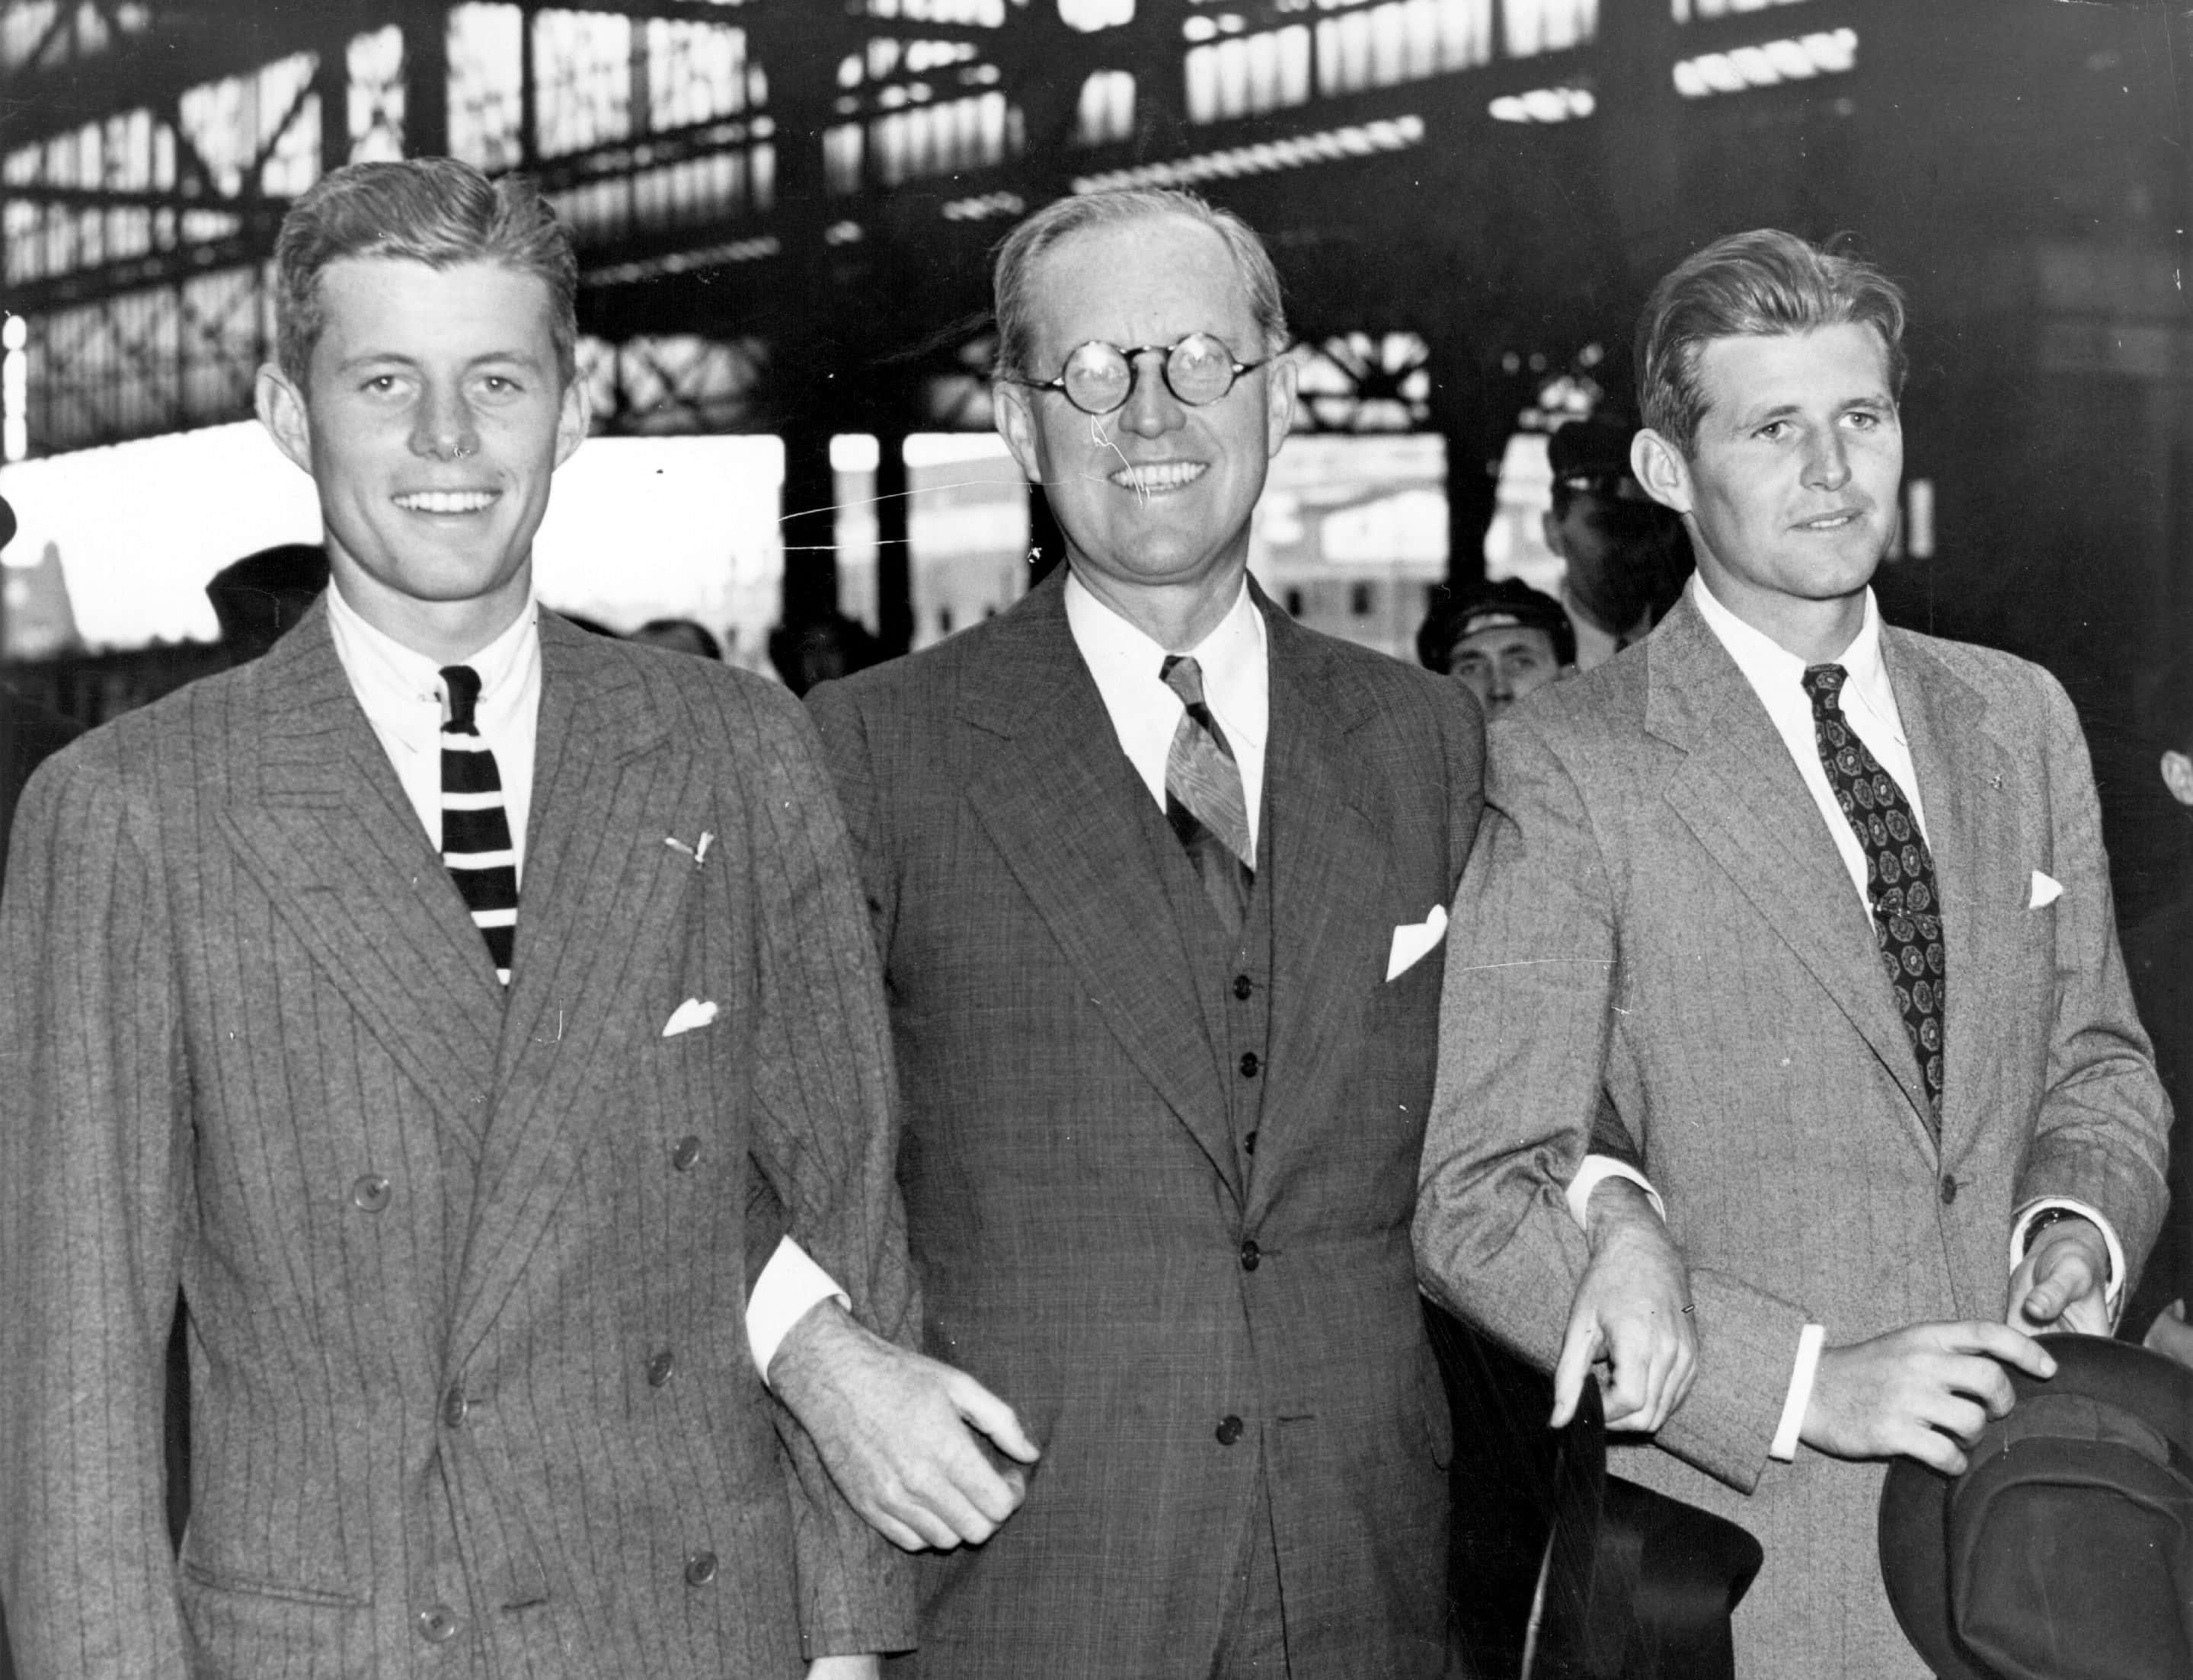 John F. Kennedy facts